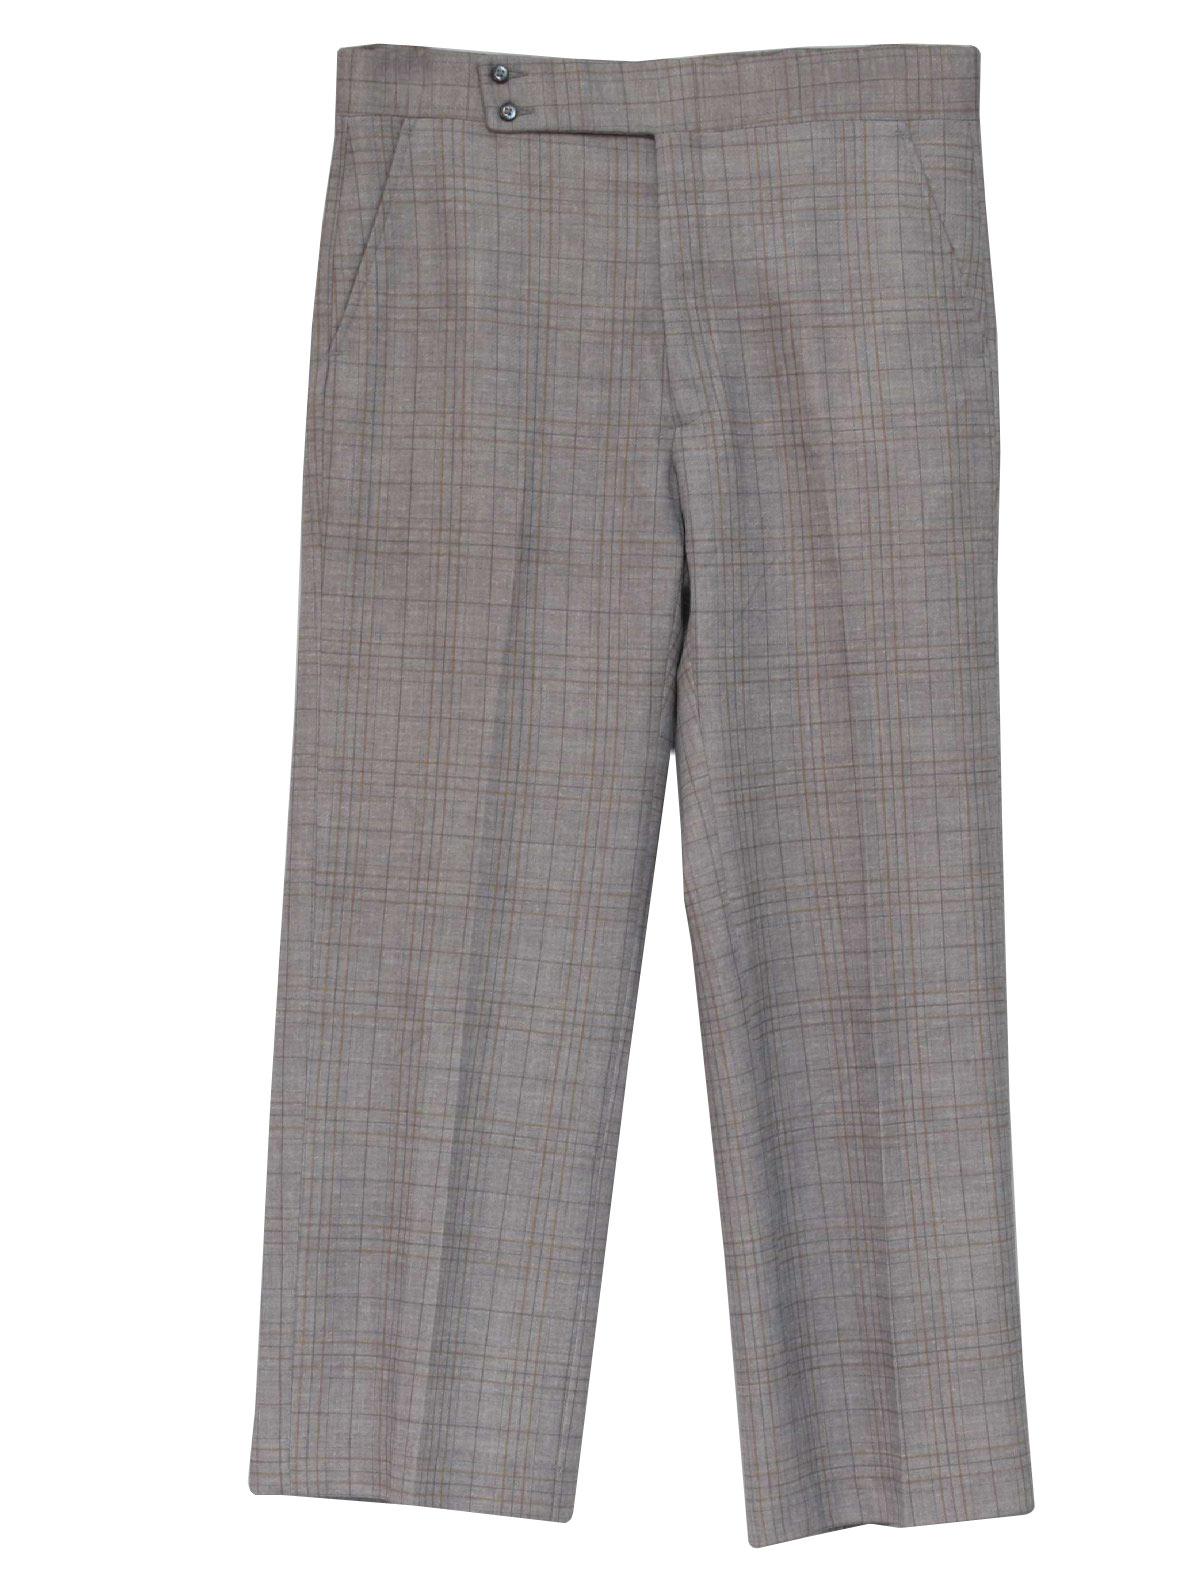 Retro 1970s Pants 70s Haggar Mens Grey Mustard Yellow